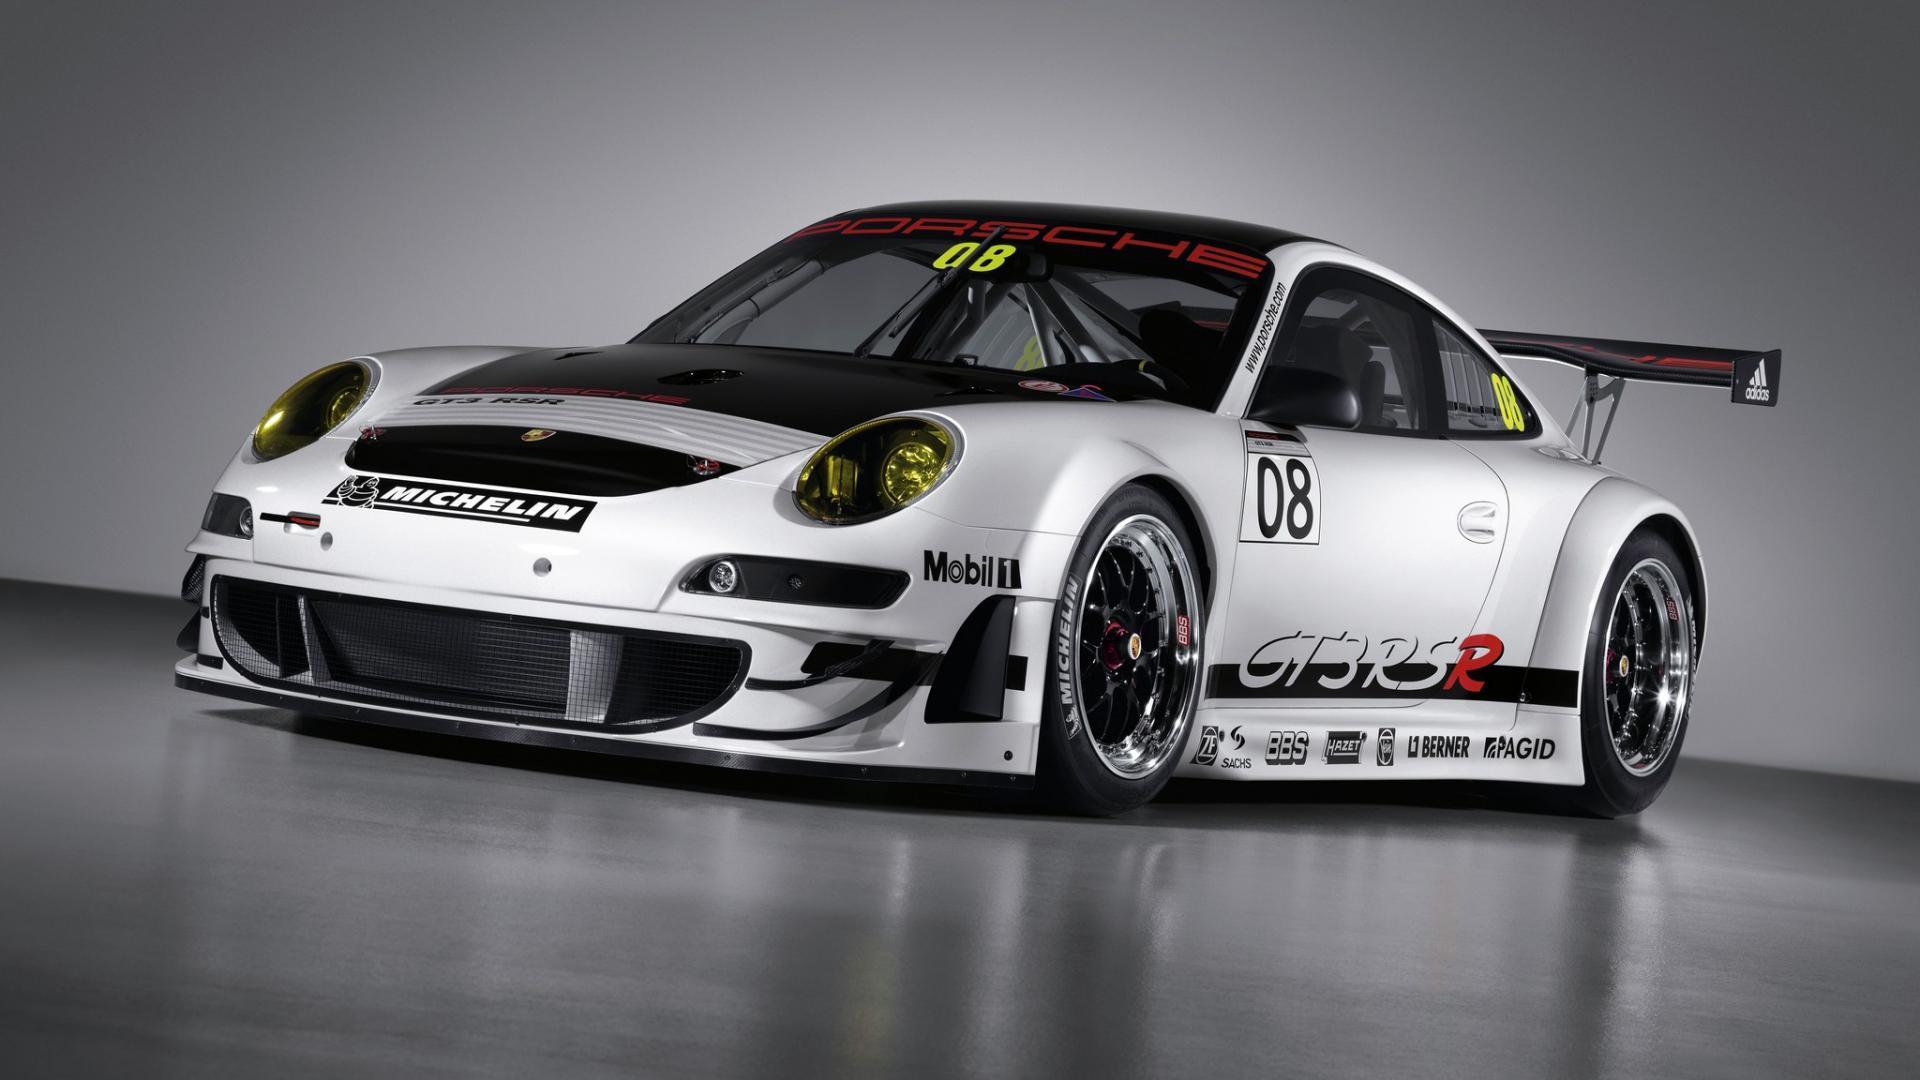 Porsche 911 GT3 RSR Exclusive HD Wallpapers 1273 1920x1080